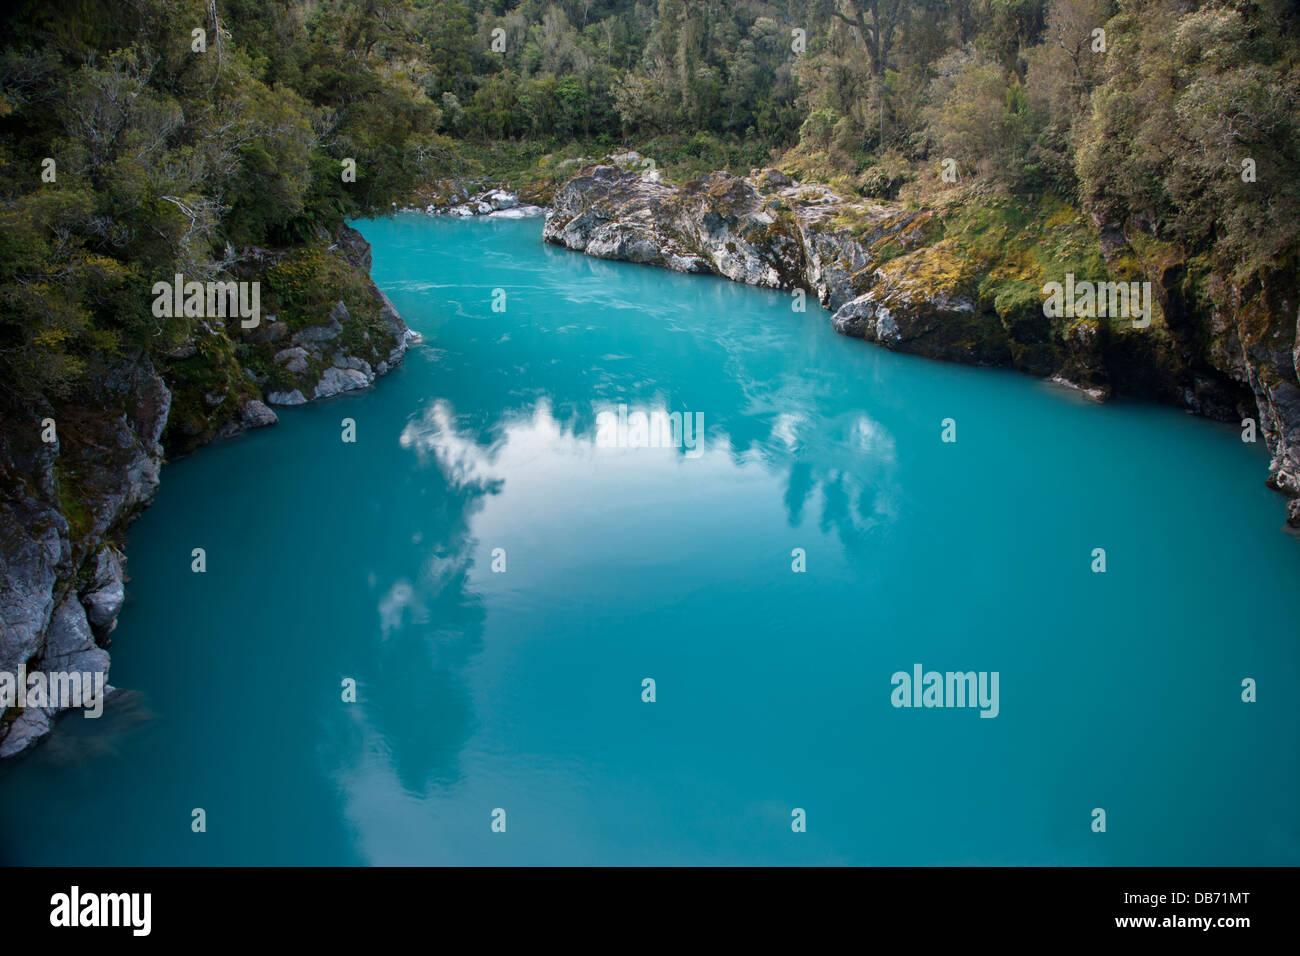 South Pacific, New Zealand, South Island. The glacial, flour-laden Hokitika River. - Stock Image